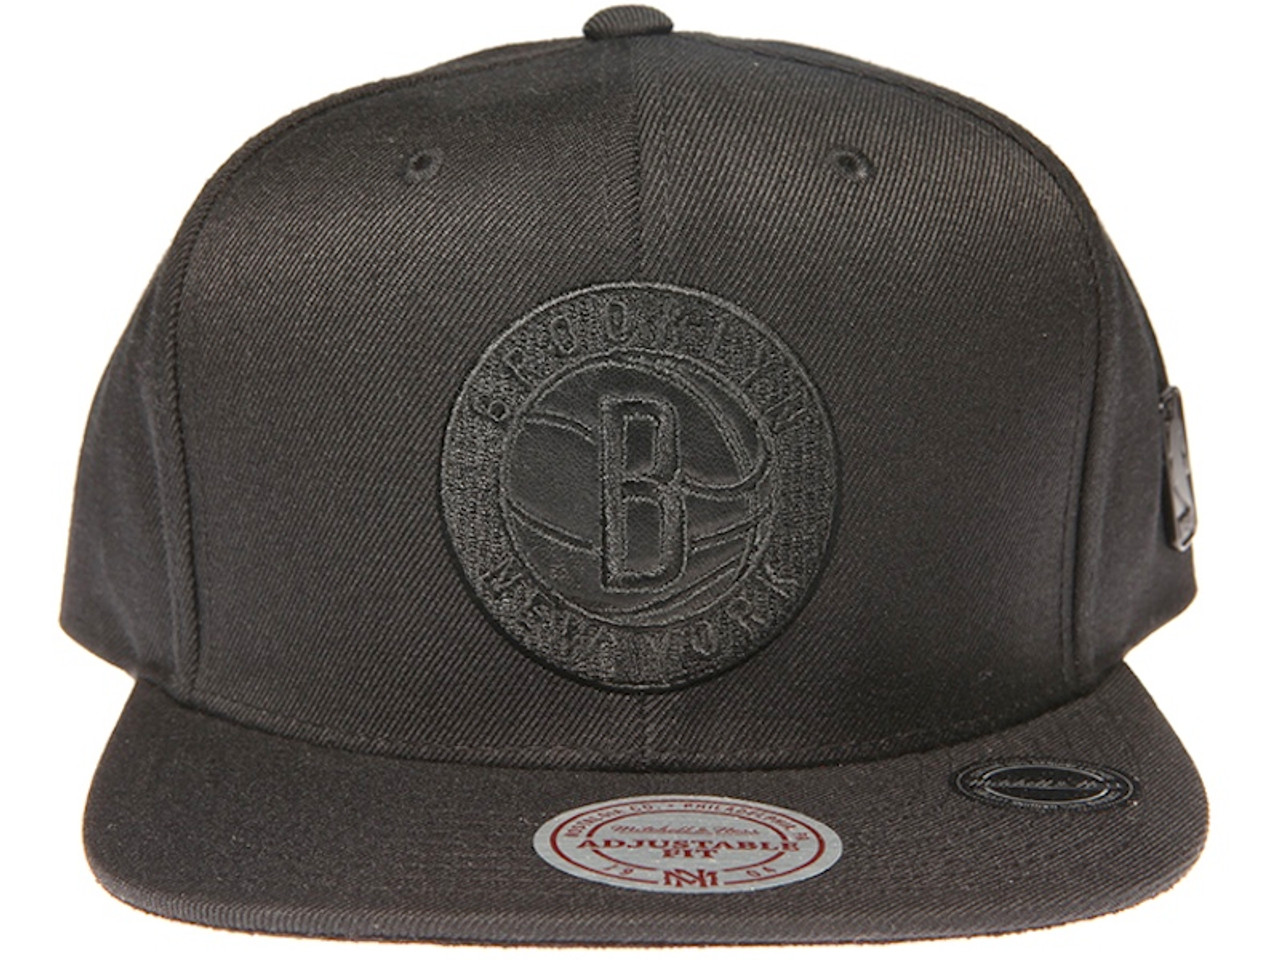 best service 9fe44 70d7d ... shop brooklyn nets genuine leather logo mitchell ness nba black snapback  hat a470f 5ceee